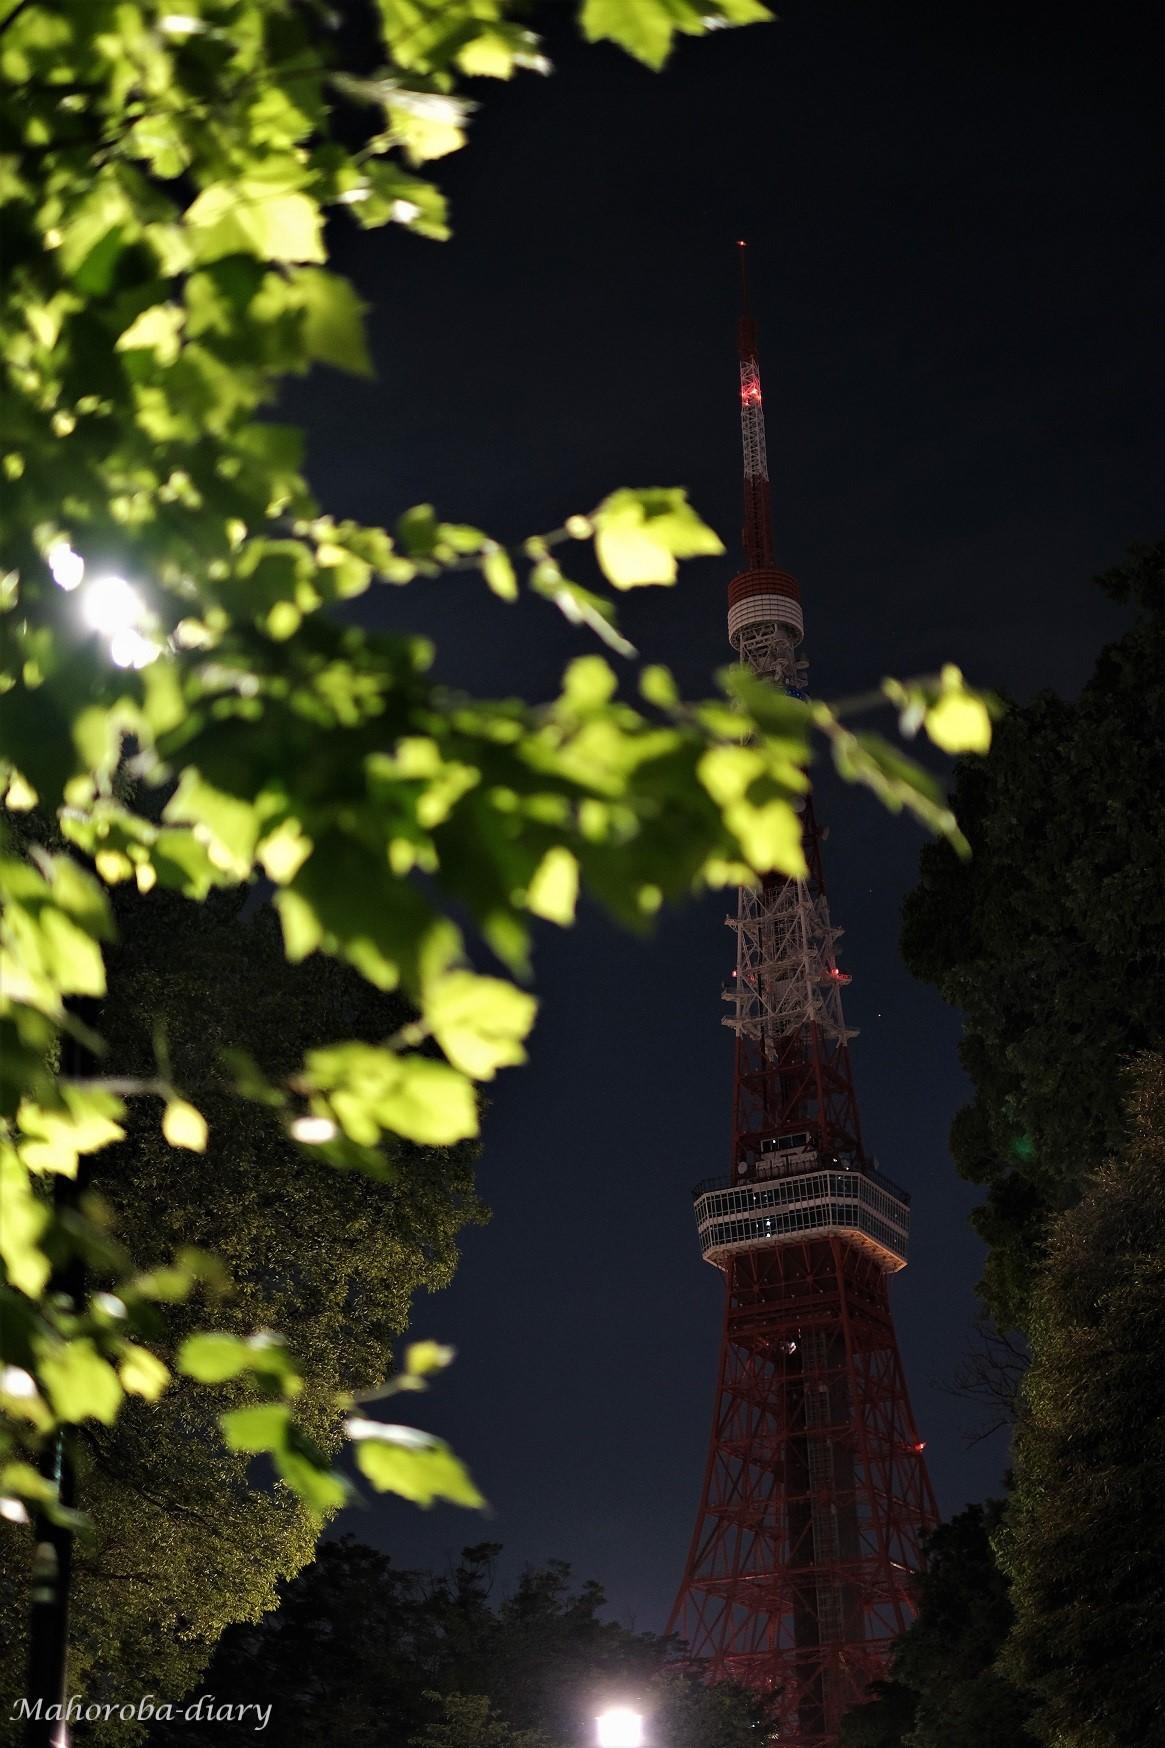 Lights off_b0362781_17330102.jpg